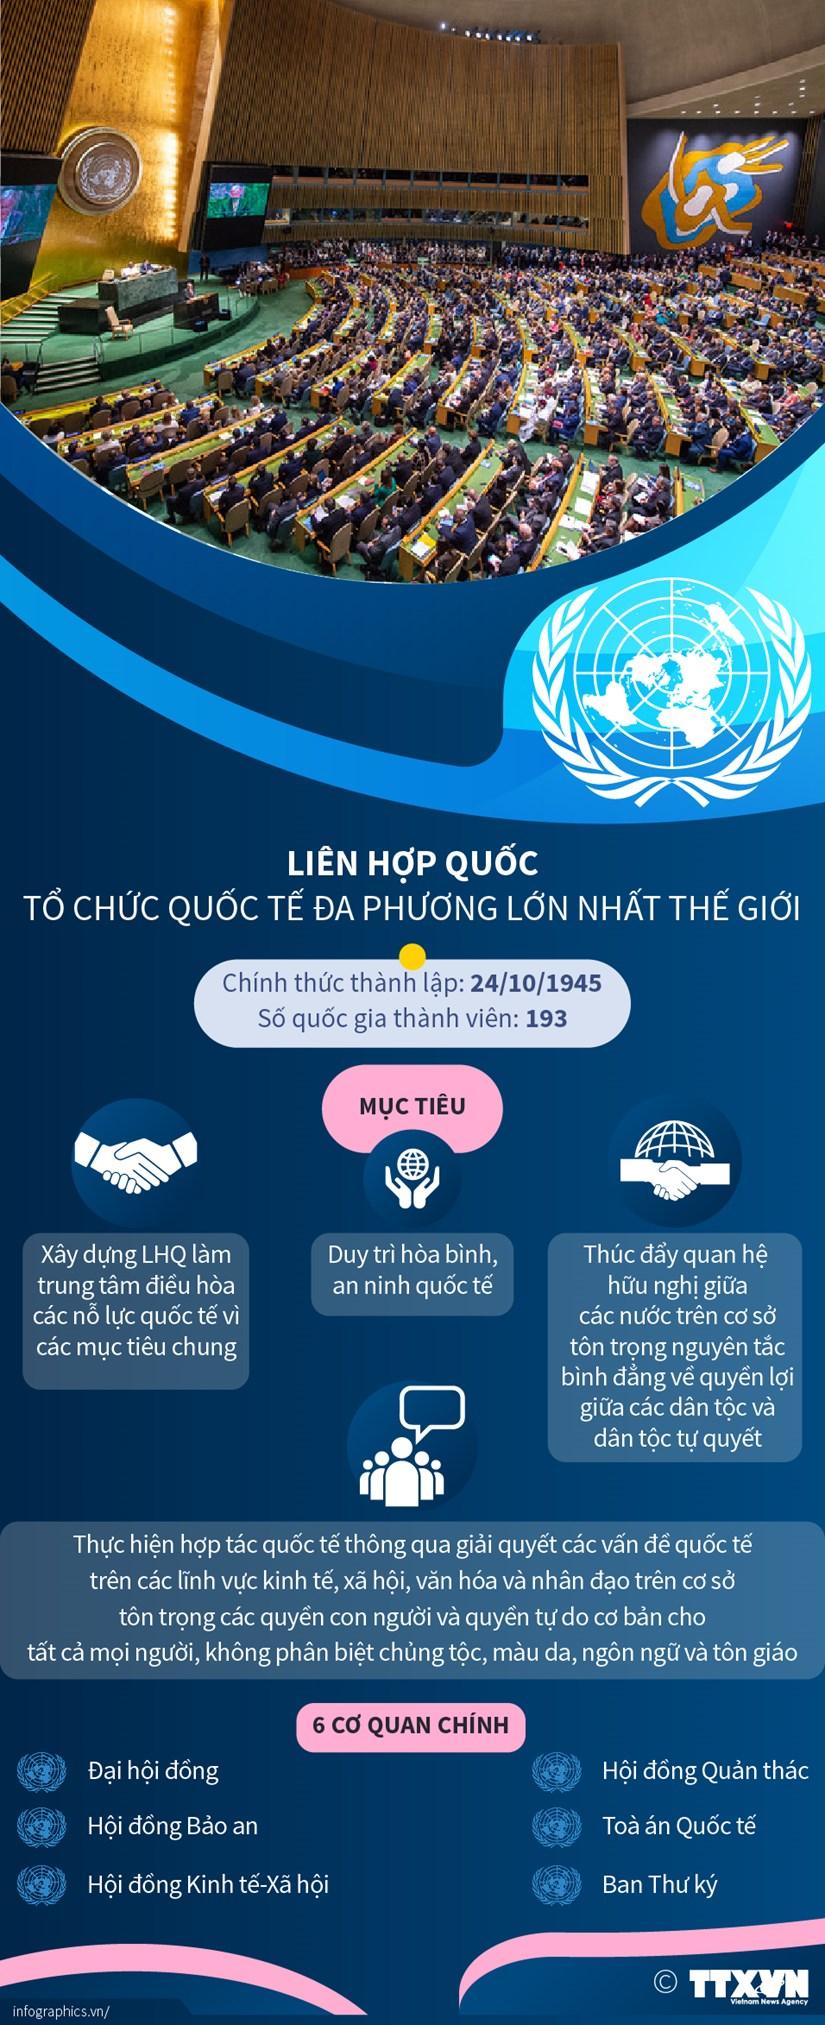 Lien hop quoc - to chuc quoc te da phuong lon nhat the gioi hinh anh 1